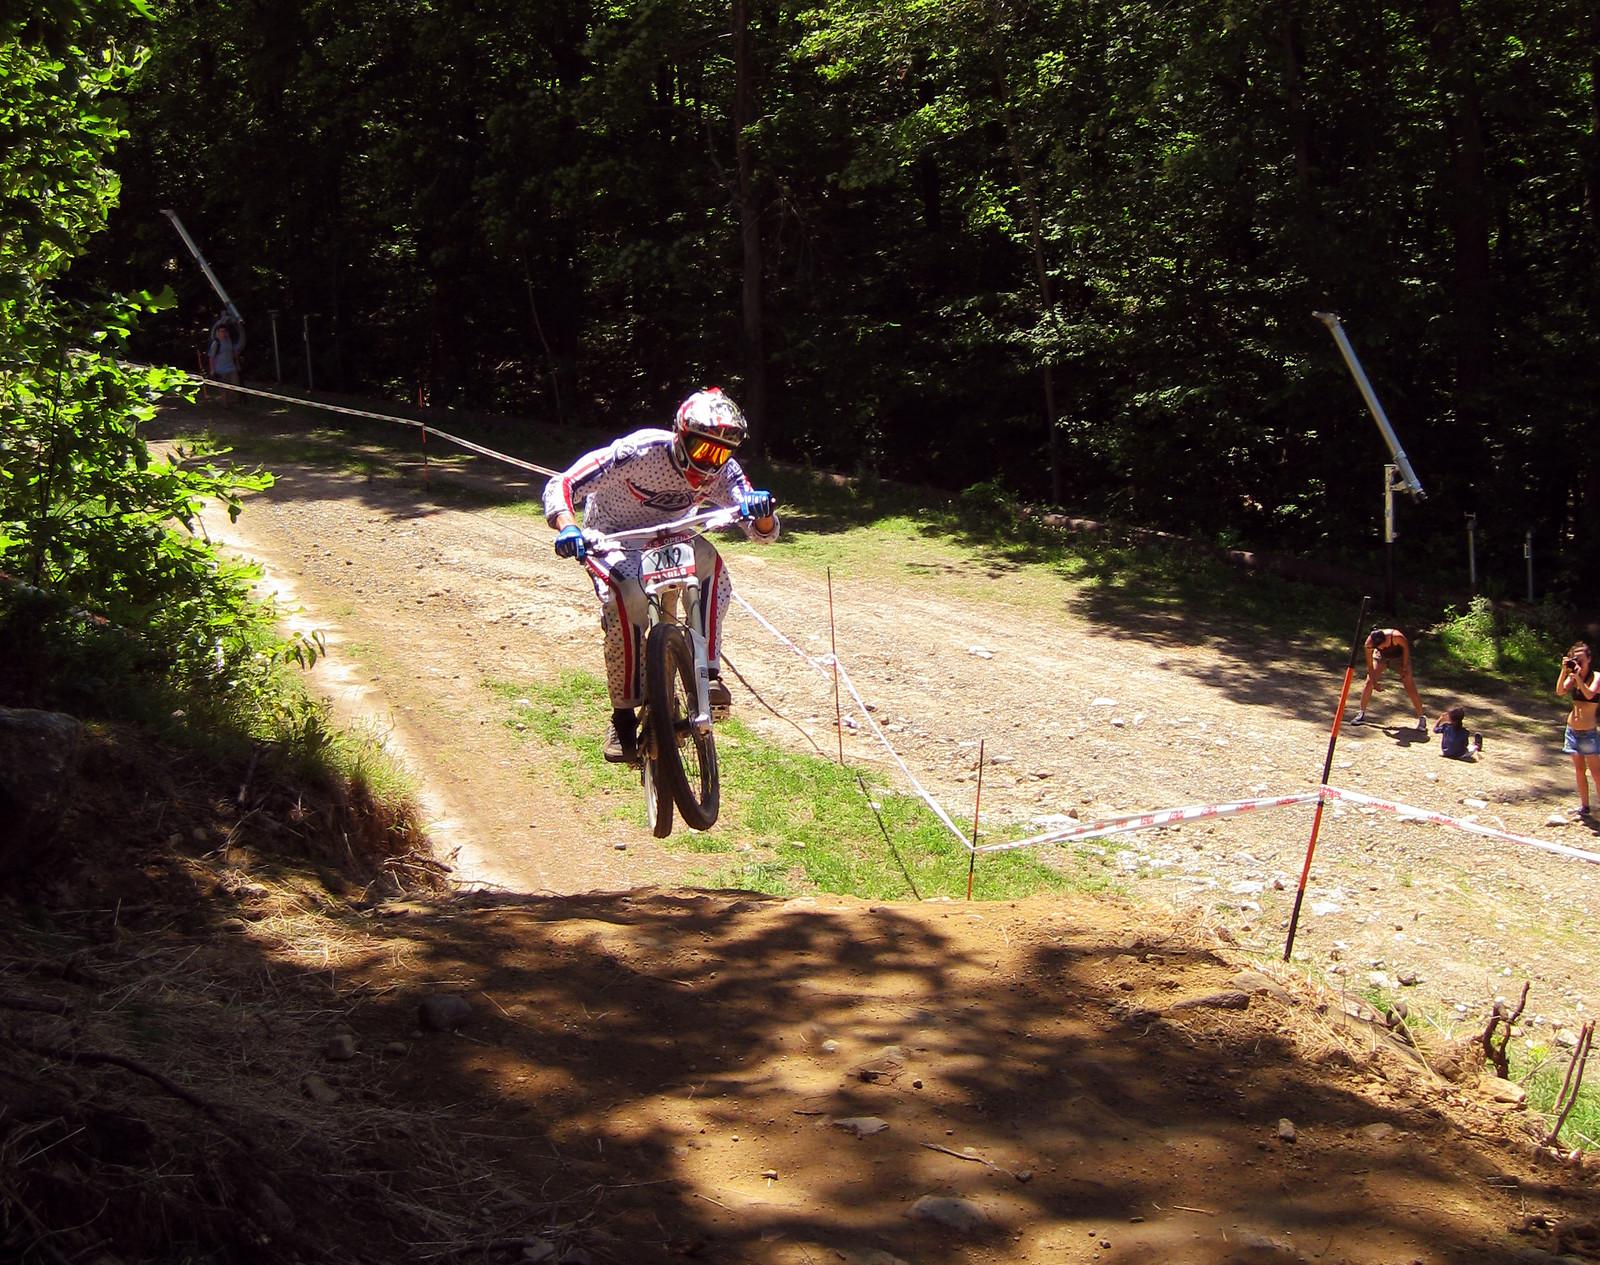 Steppin' Up - bastard4life - Mountain Biking Pictures - Vital MTB